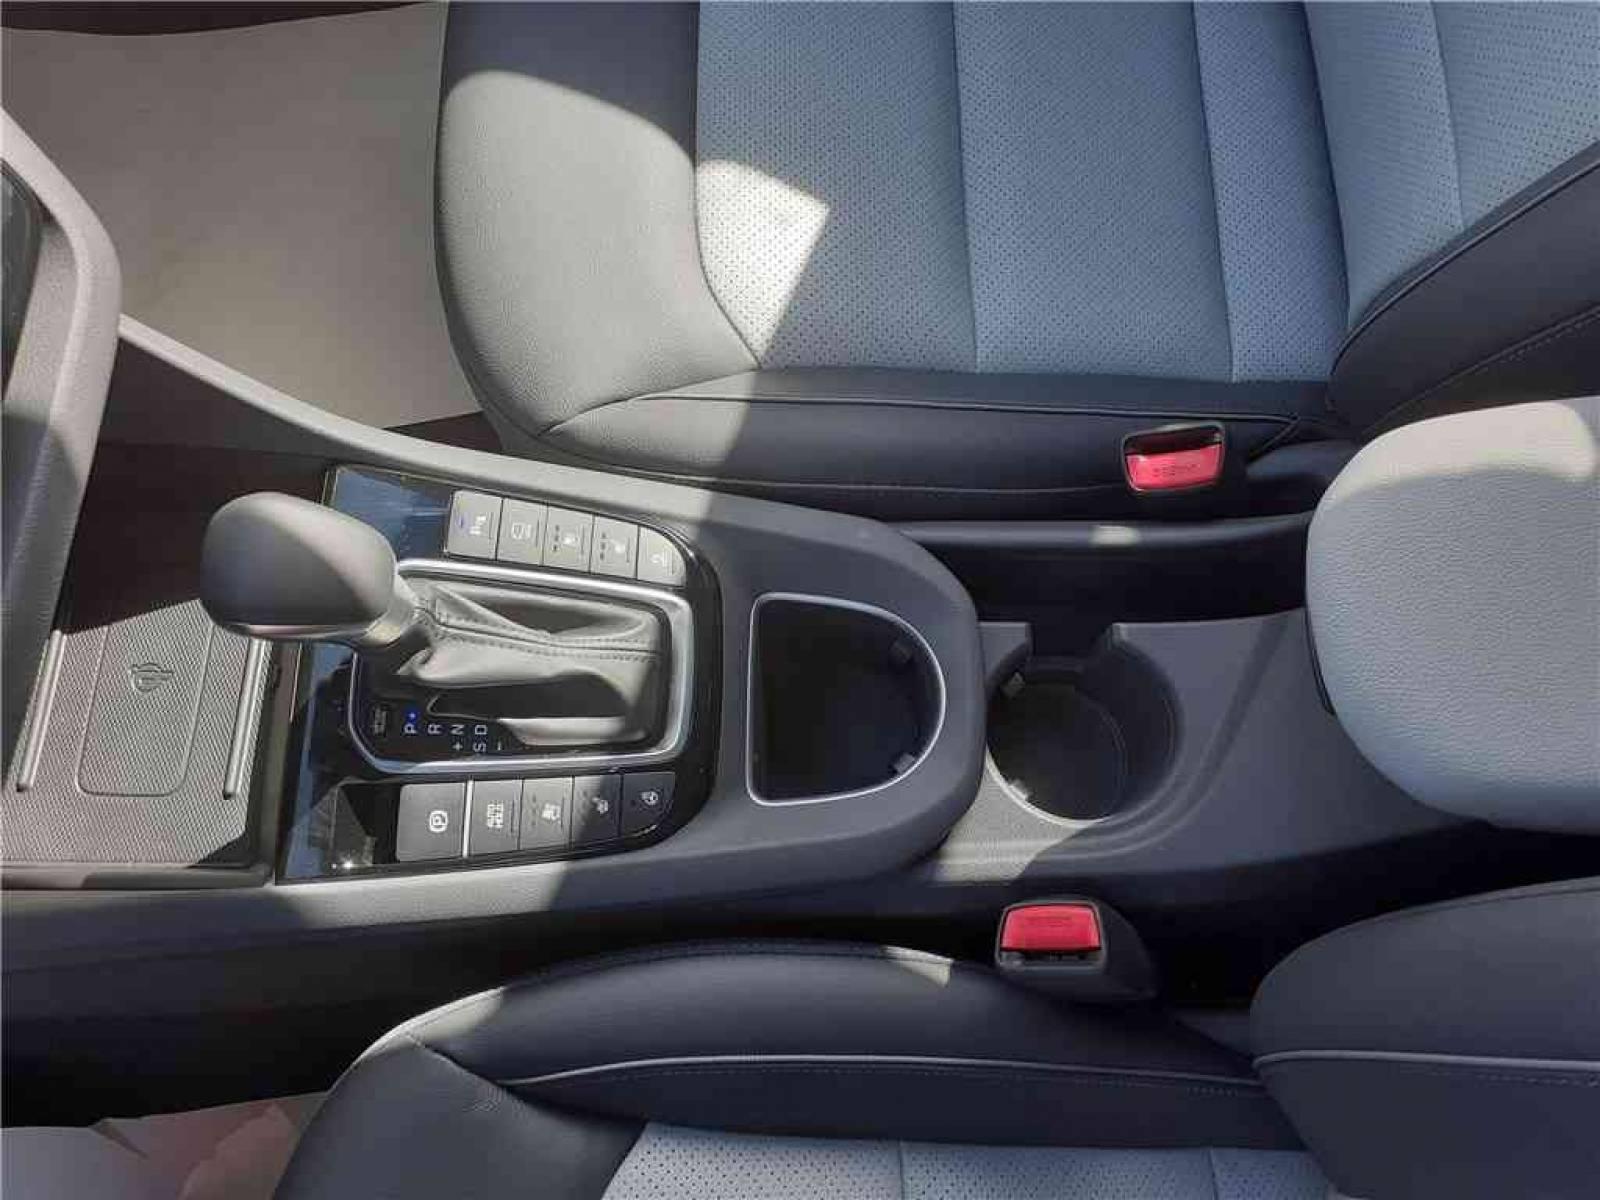 HYUNDAI Ioniq Plug-in 141 ch - véhicule d'occasion - Groupe Guillet - Chalon Automobiles - 71100 - Chalon-sur-Saône - 23